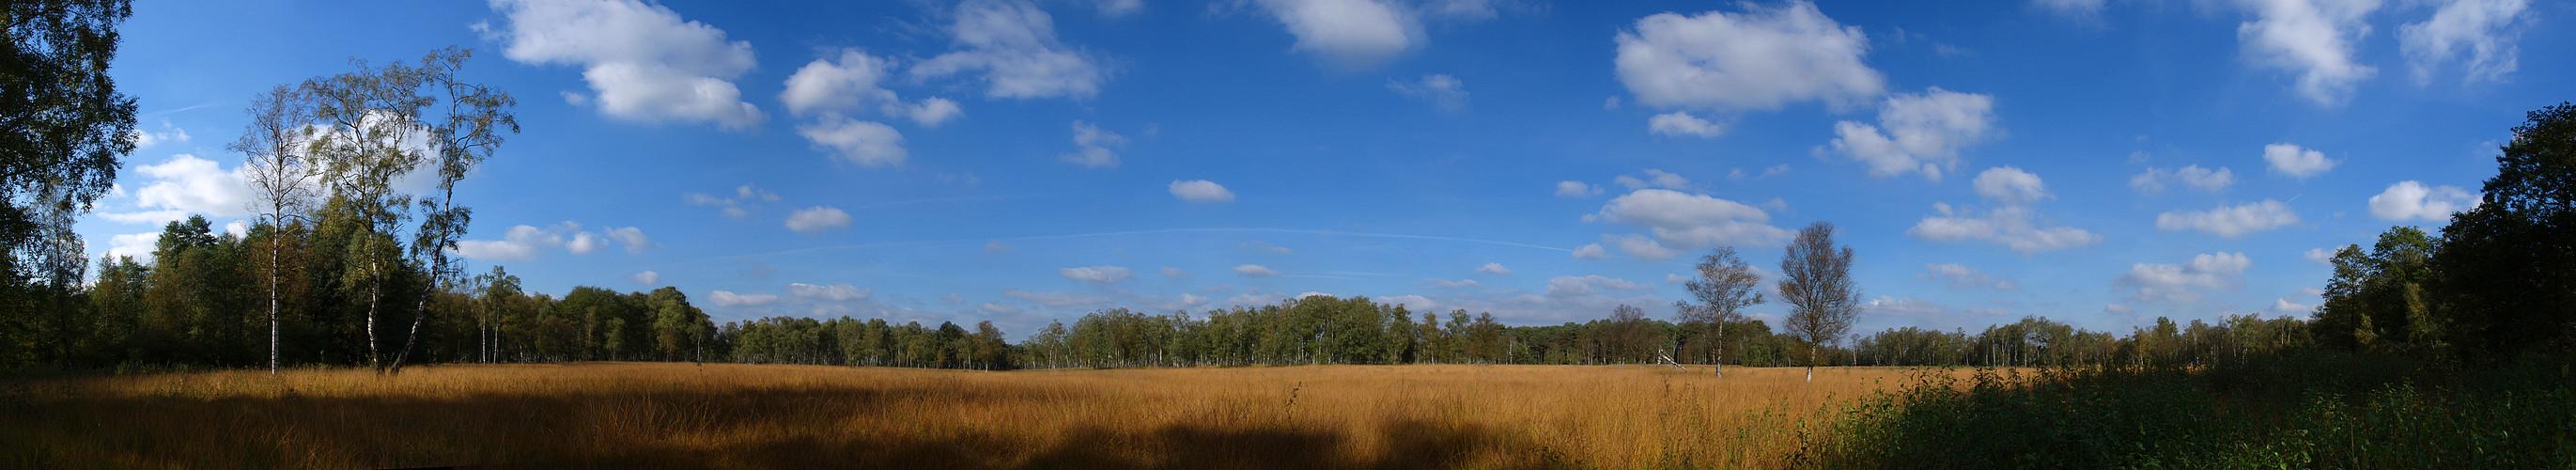 Herbsttag im Duvenstedter Brook